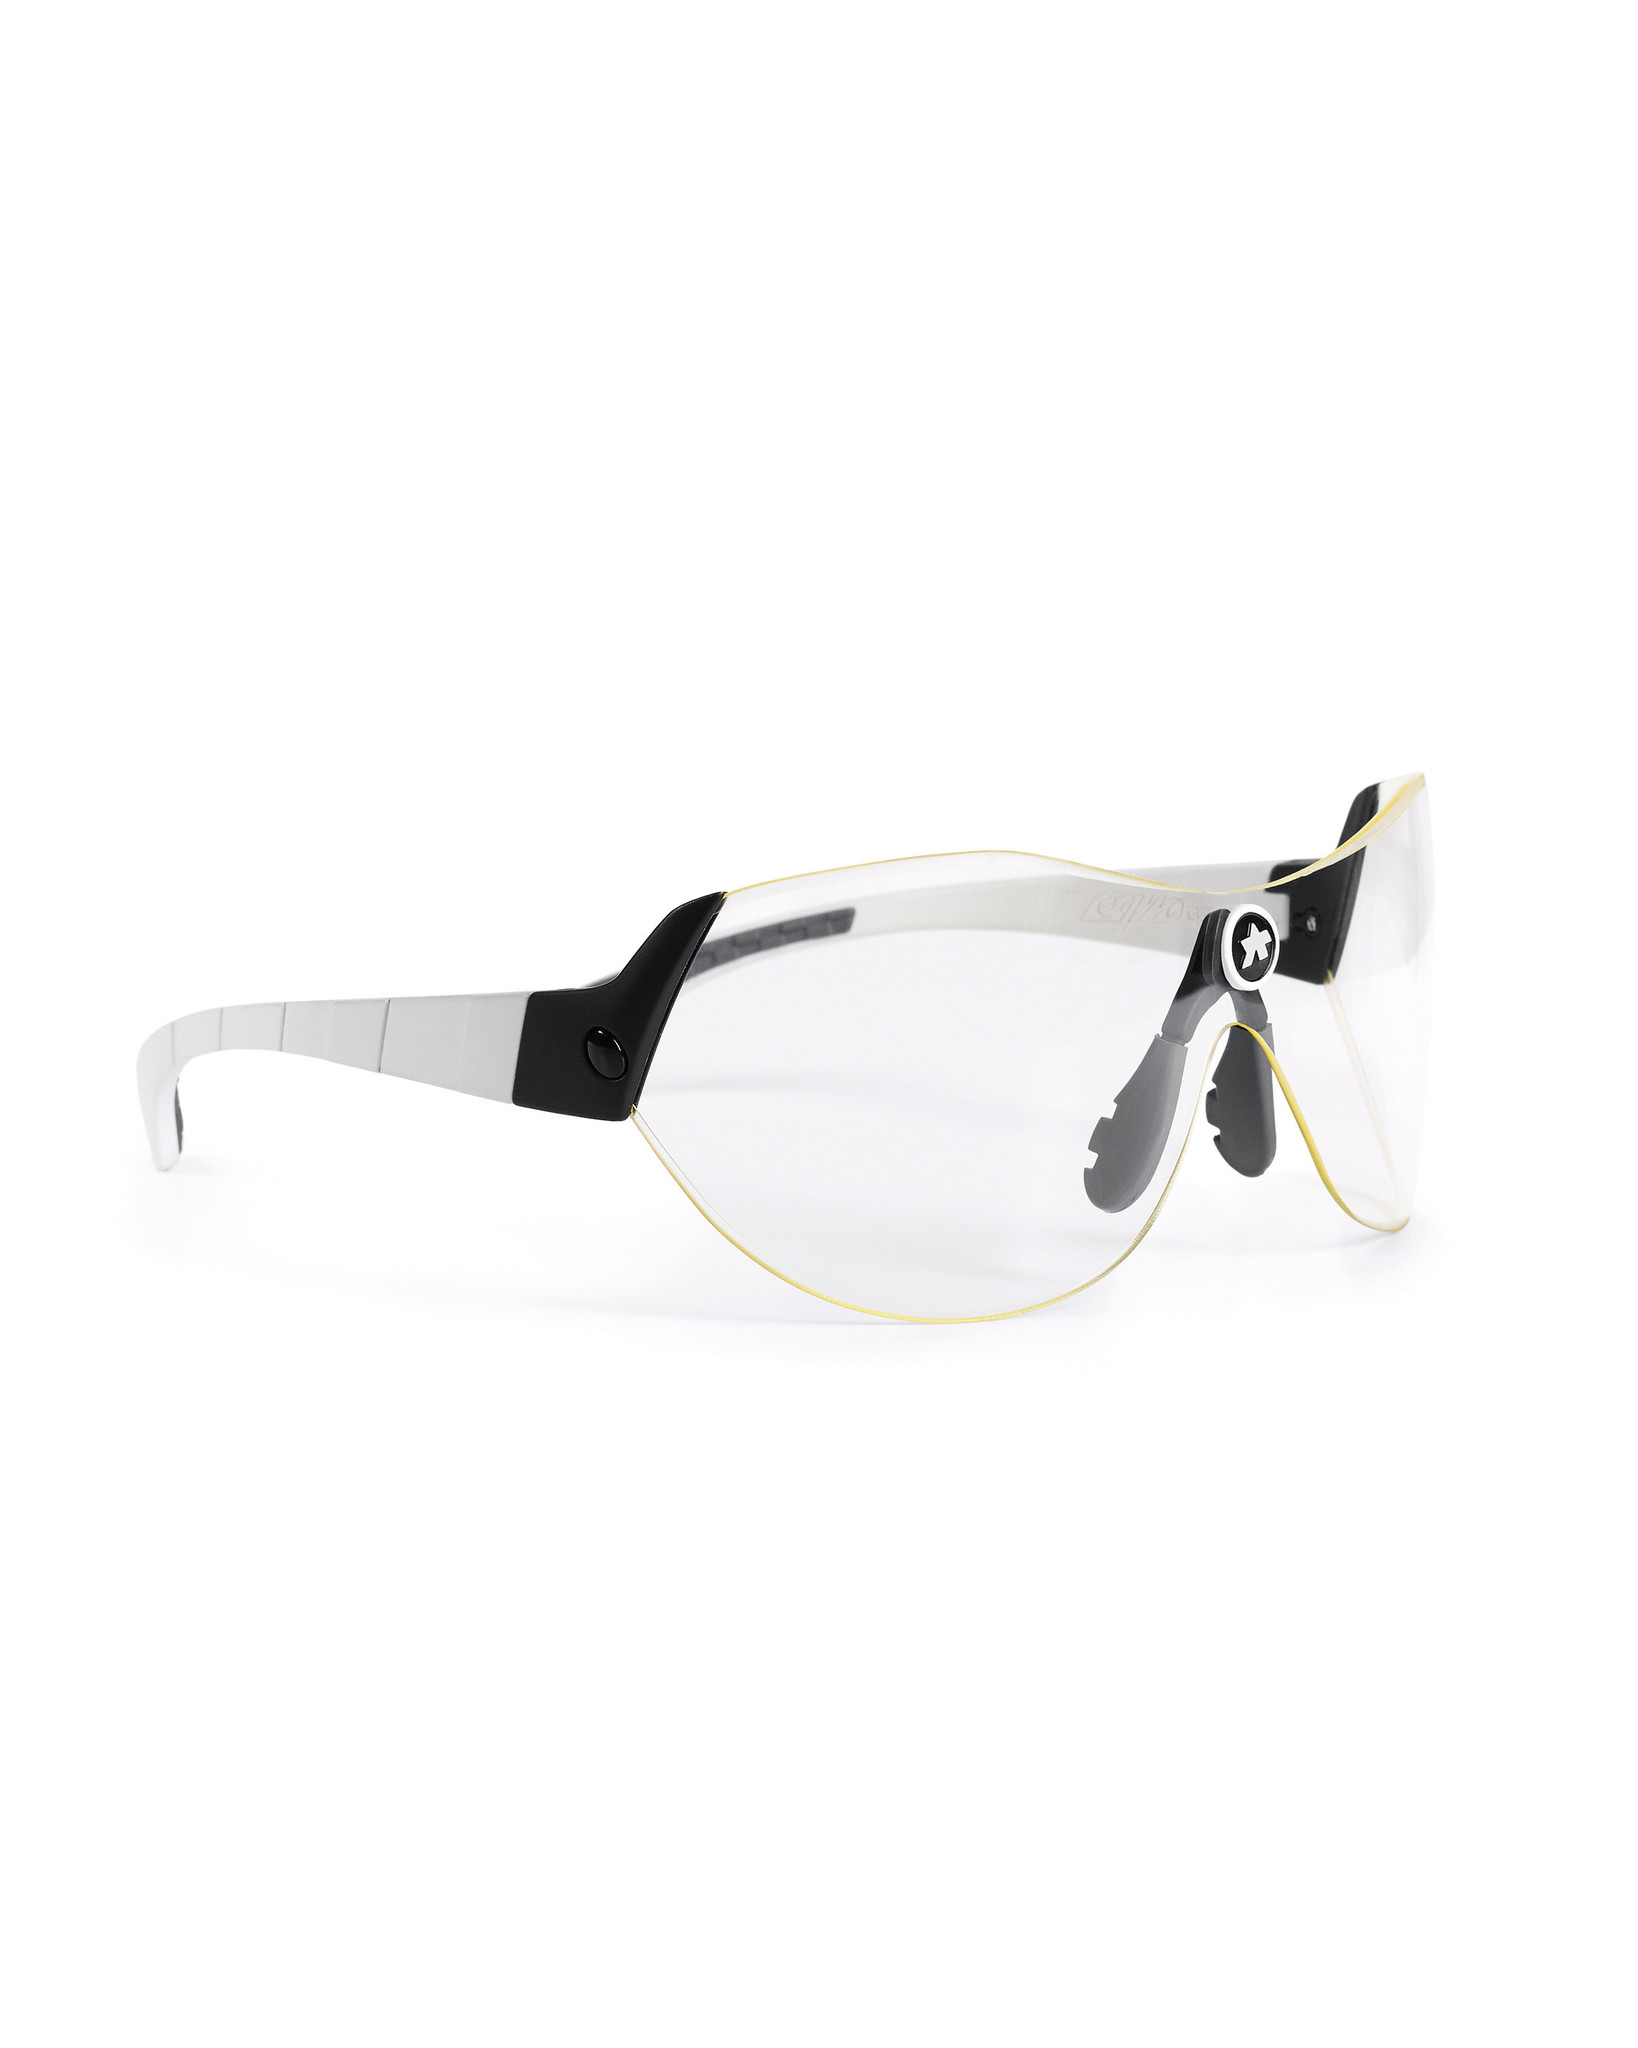 Assos Zegho G2 Interceptor Black fietsbril